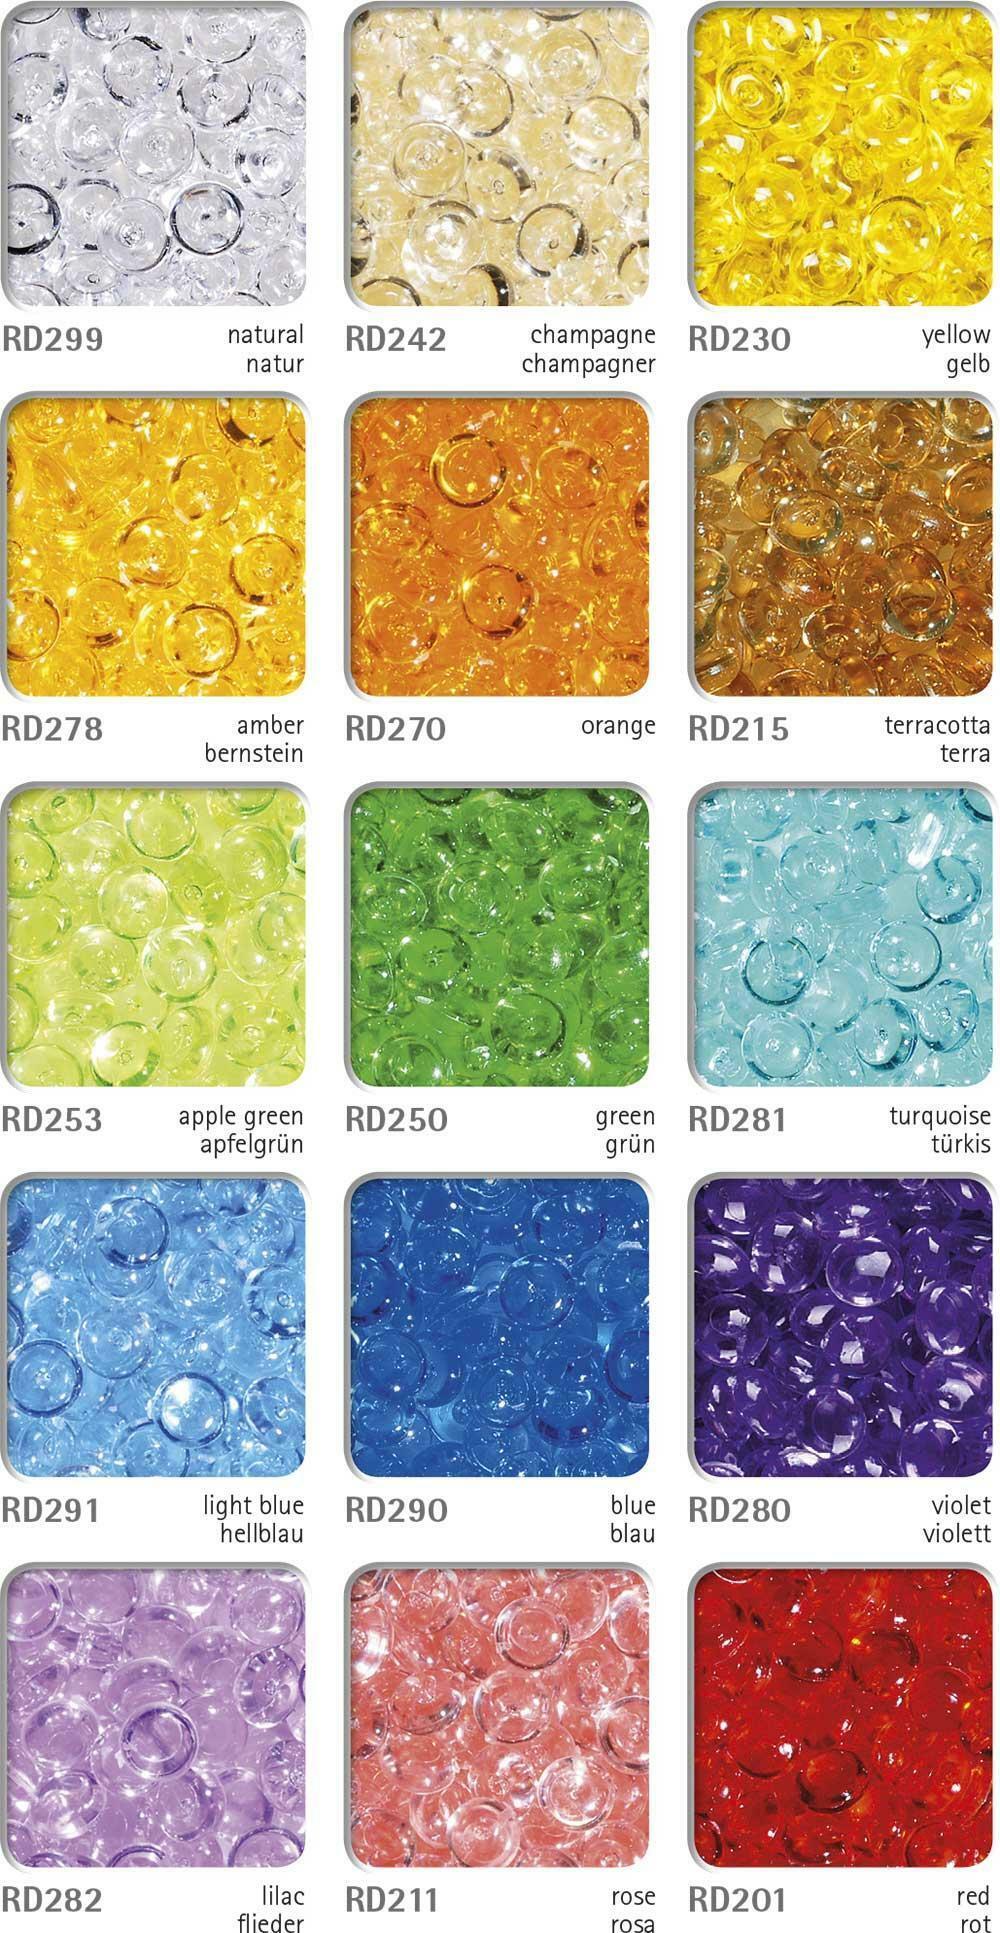 eurosand gocce di pioggia 2-4 mm in pvc viola - 333 ml